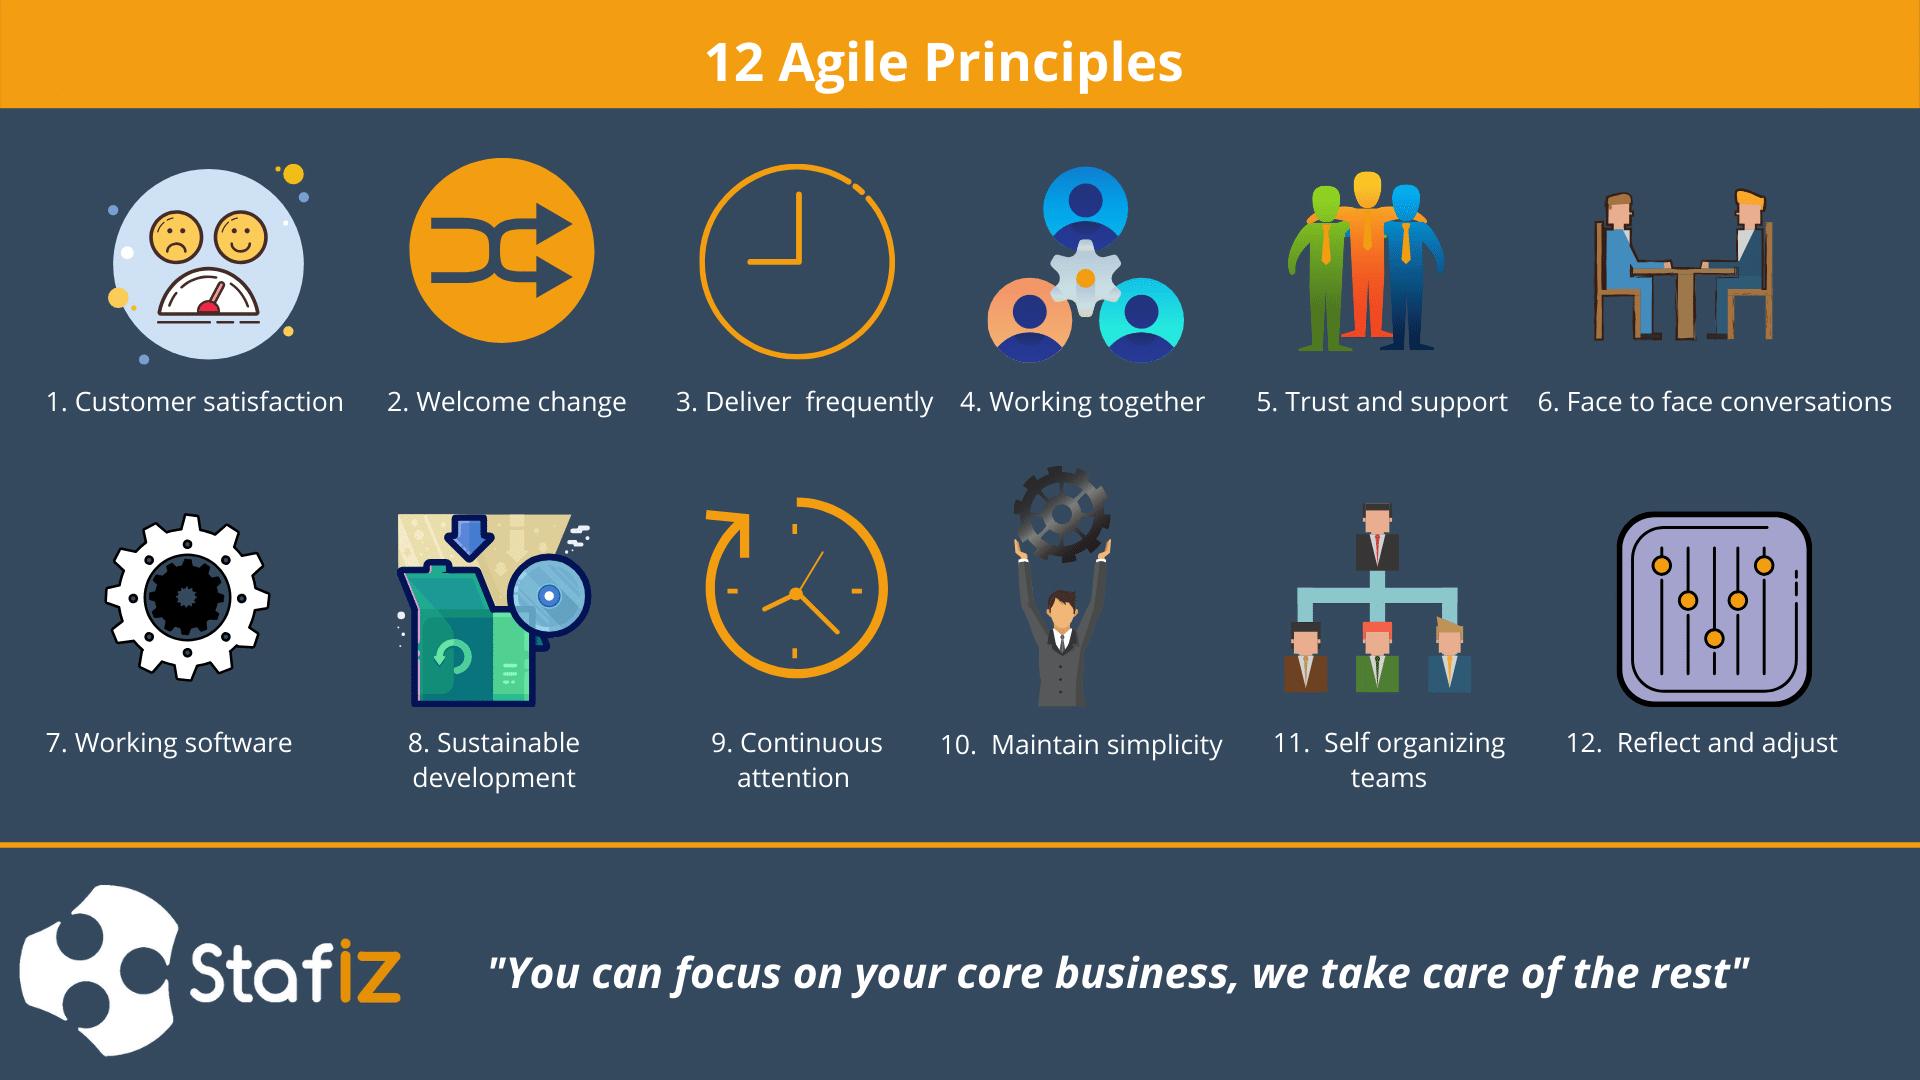 Principles of agile management